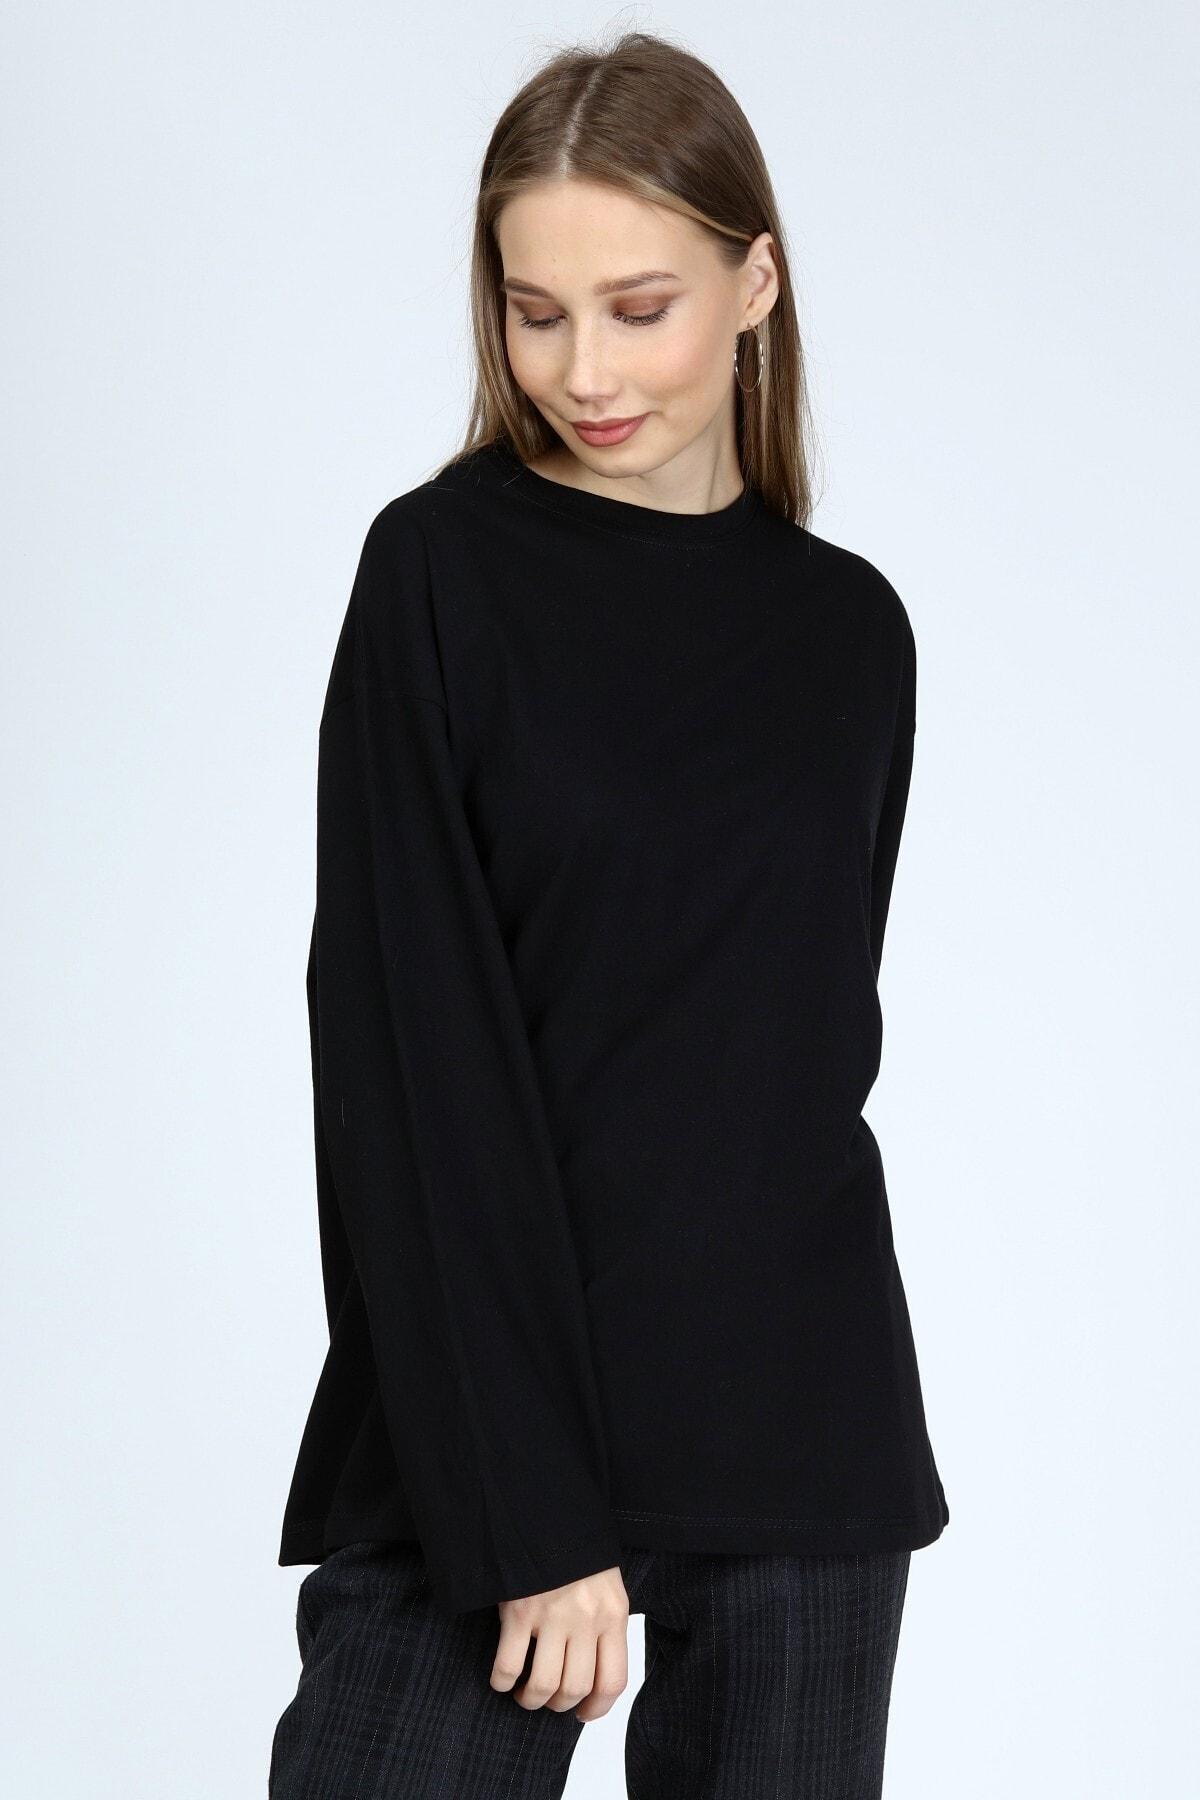 BASICA Kadın Siyah Uzun Kollu Bisiklet Yaka Basic Oversize T-shirt 1